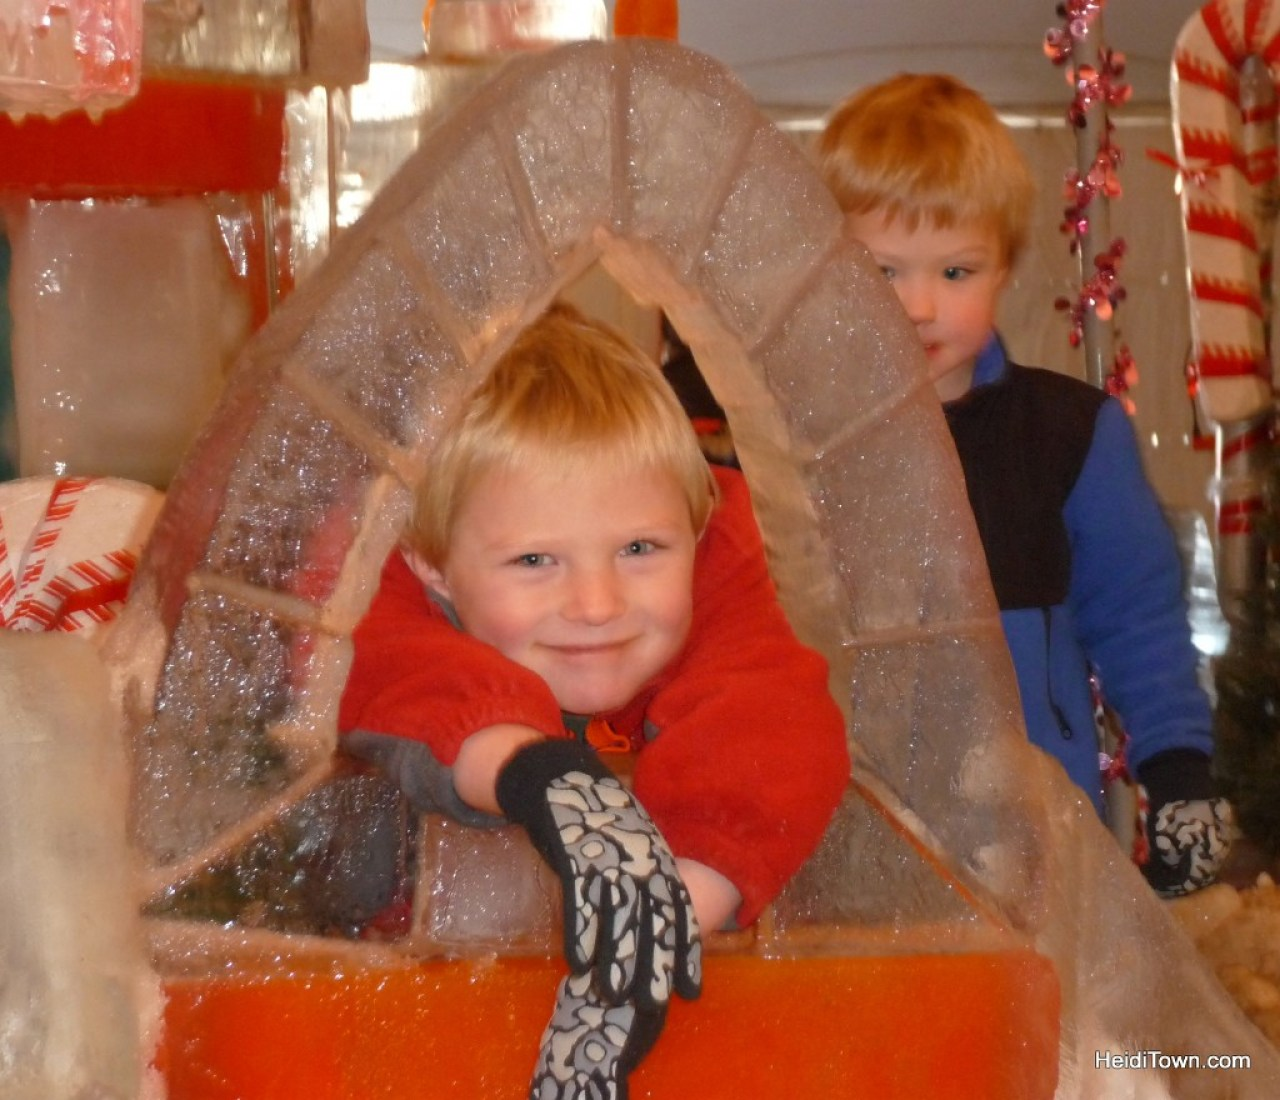 A very happy kiddo at Estes Park Winter Festival 2012.